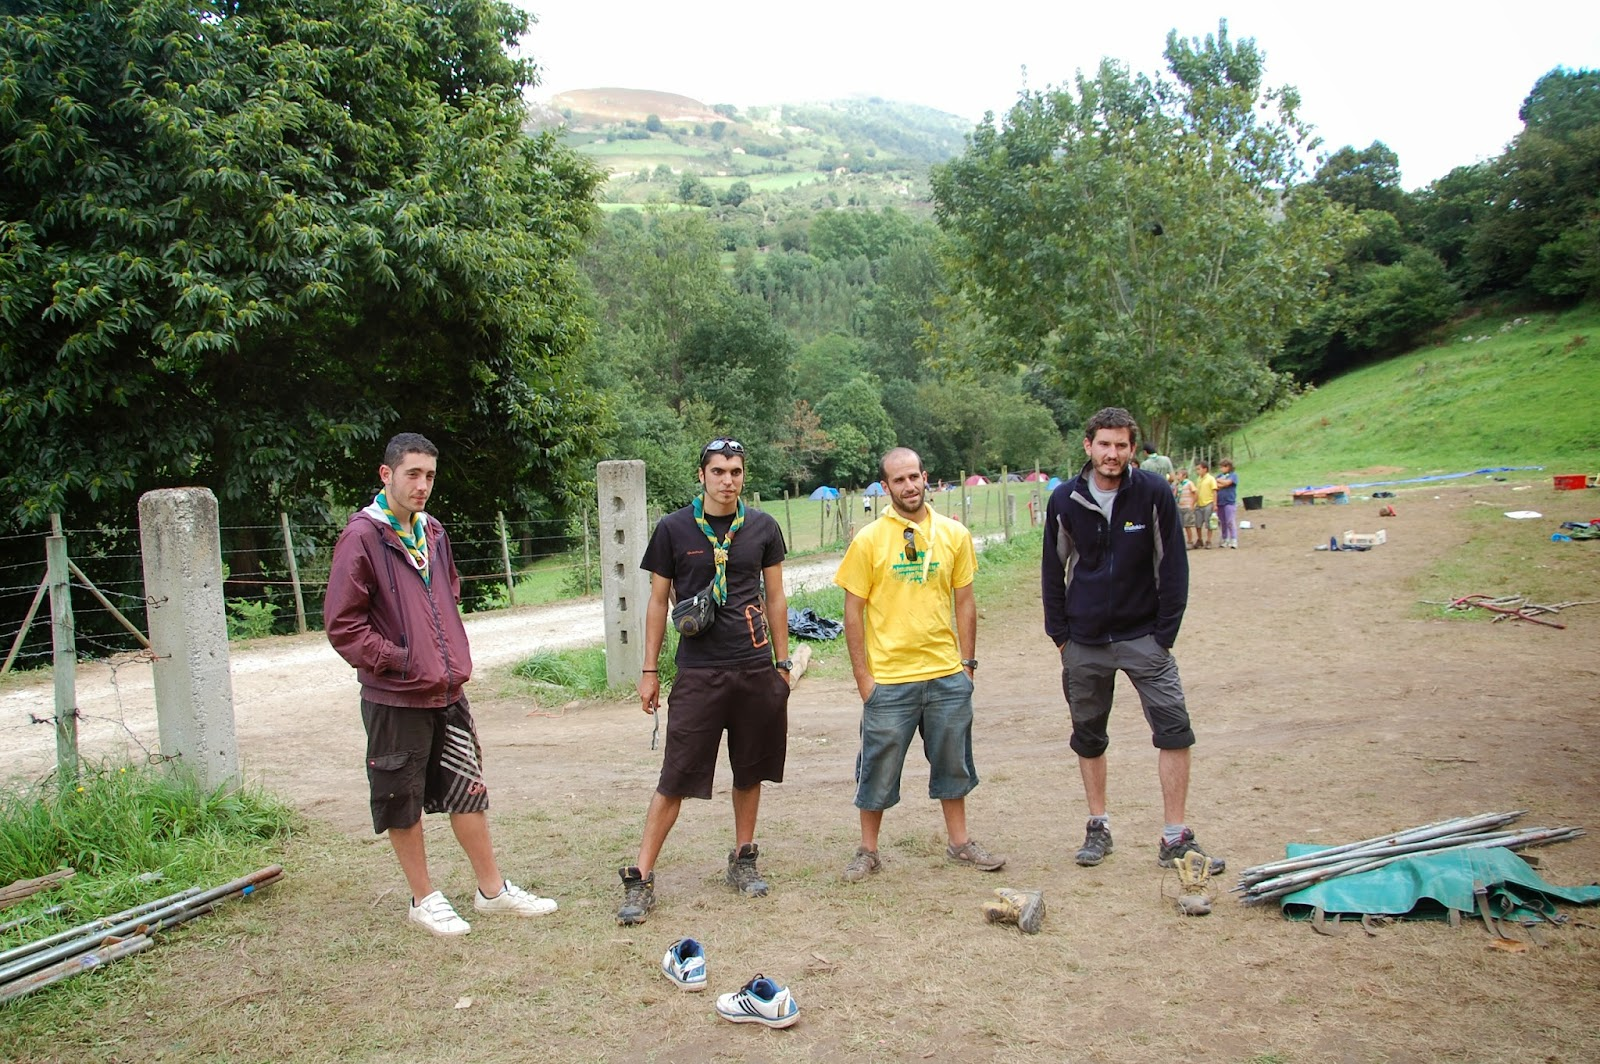 Campaments Estiu RolandKing 2011 - DSC_0354%2B2.JPG